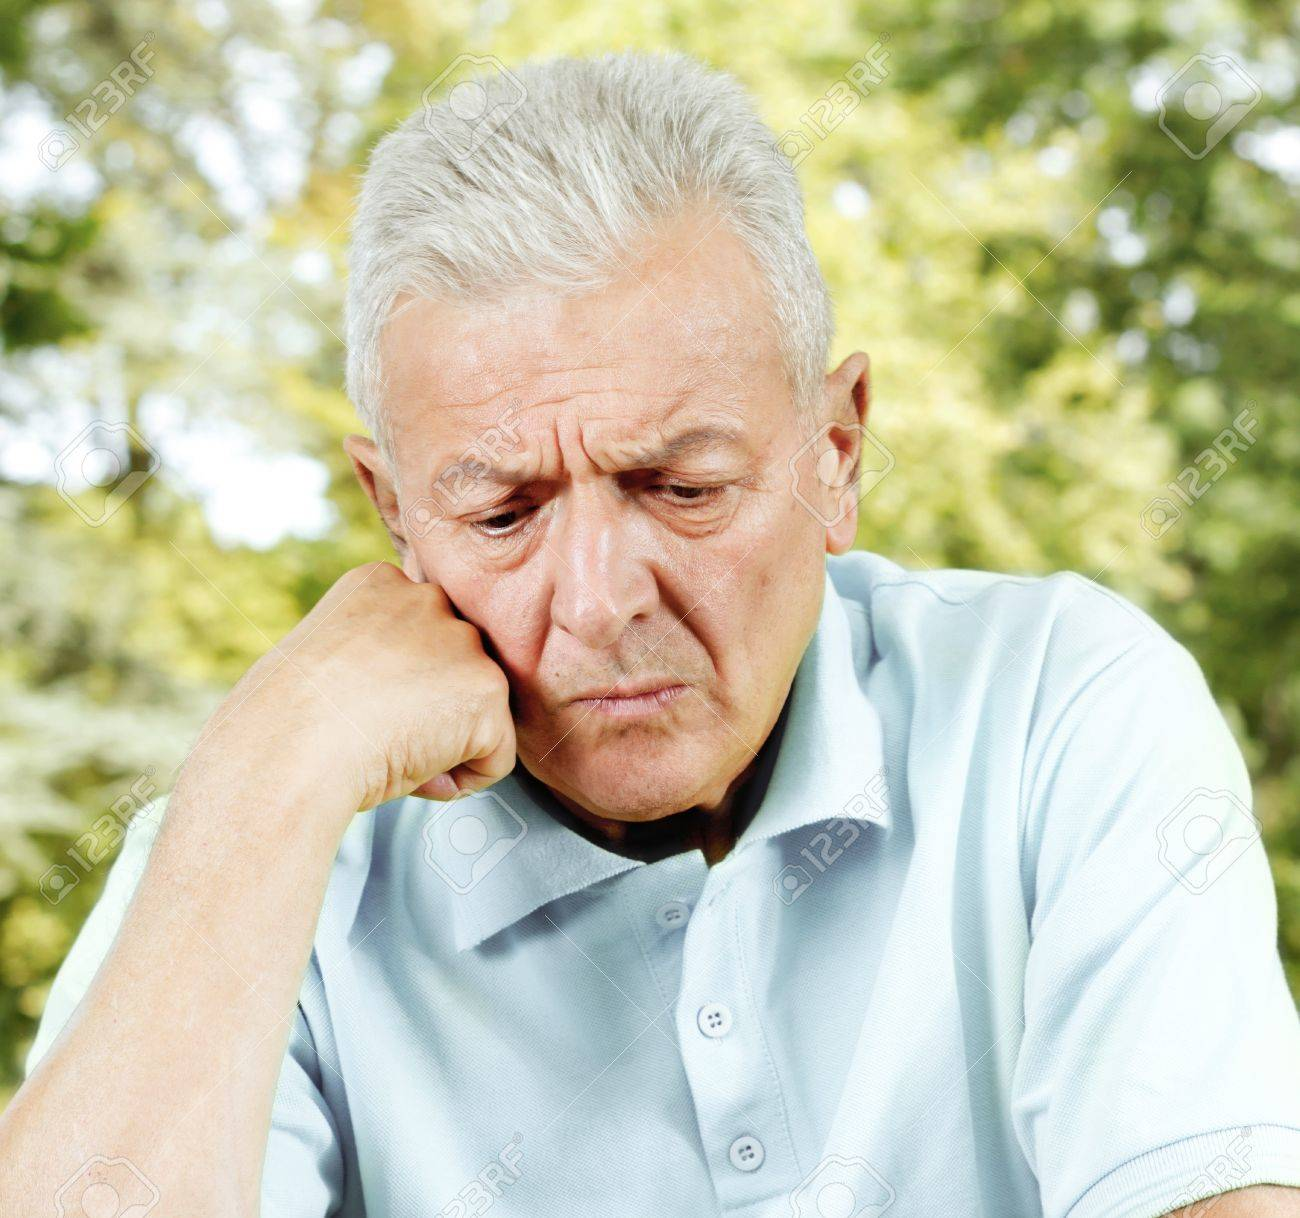 Portrait of worried senior man outdoors. - 11212445